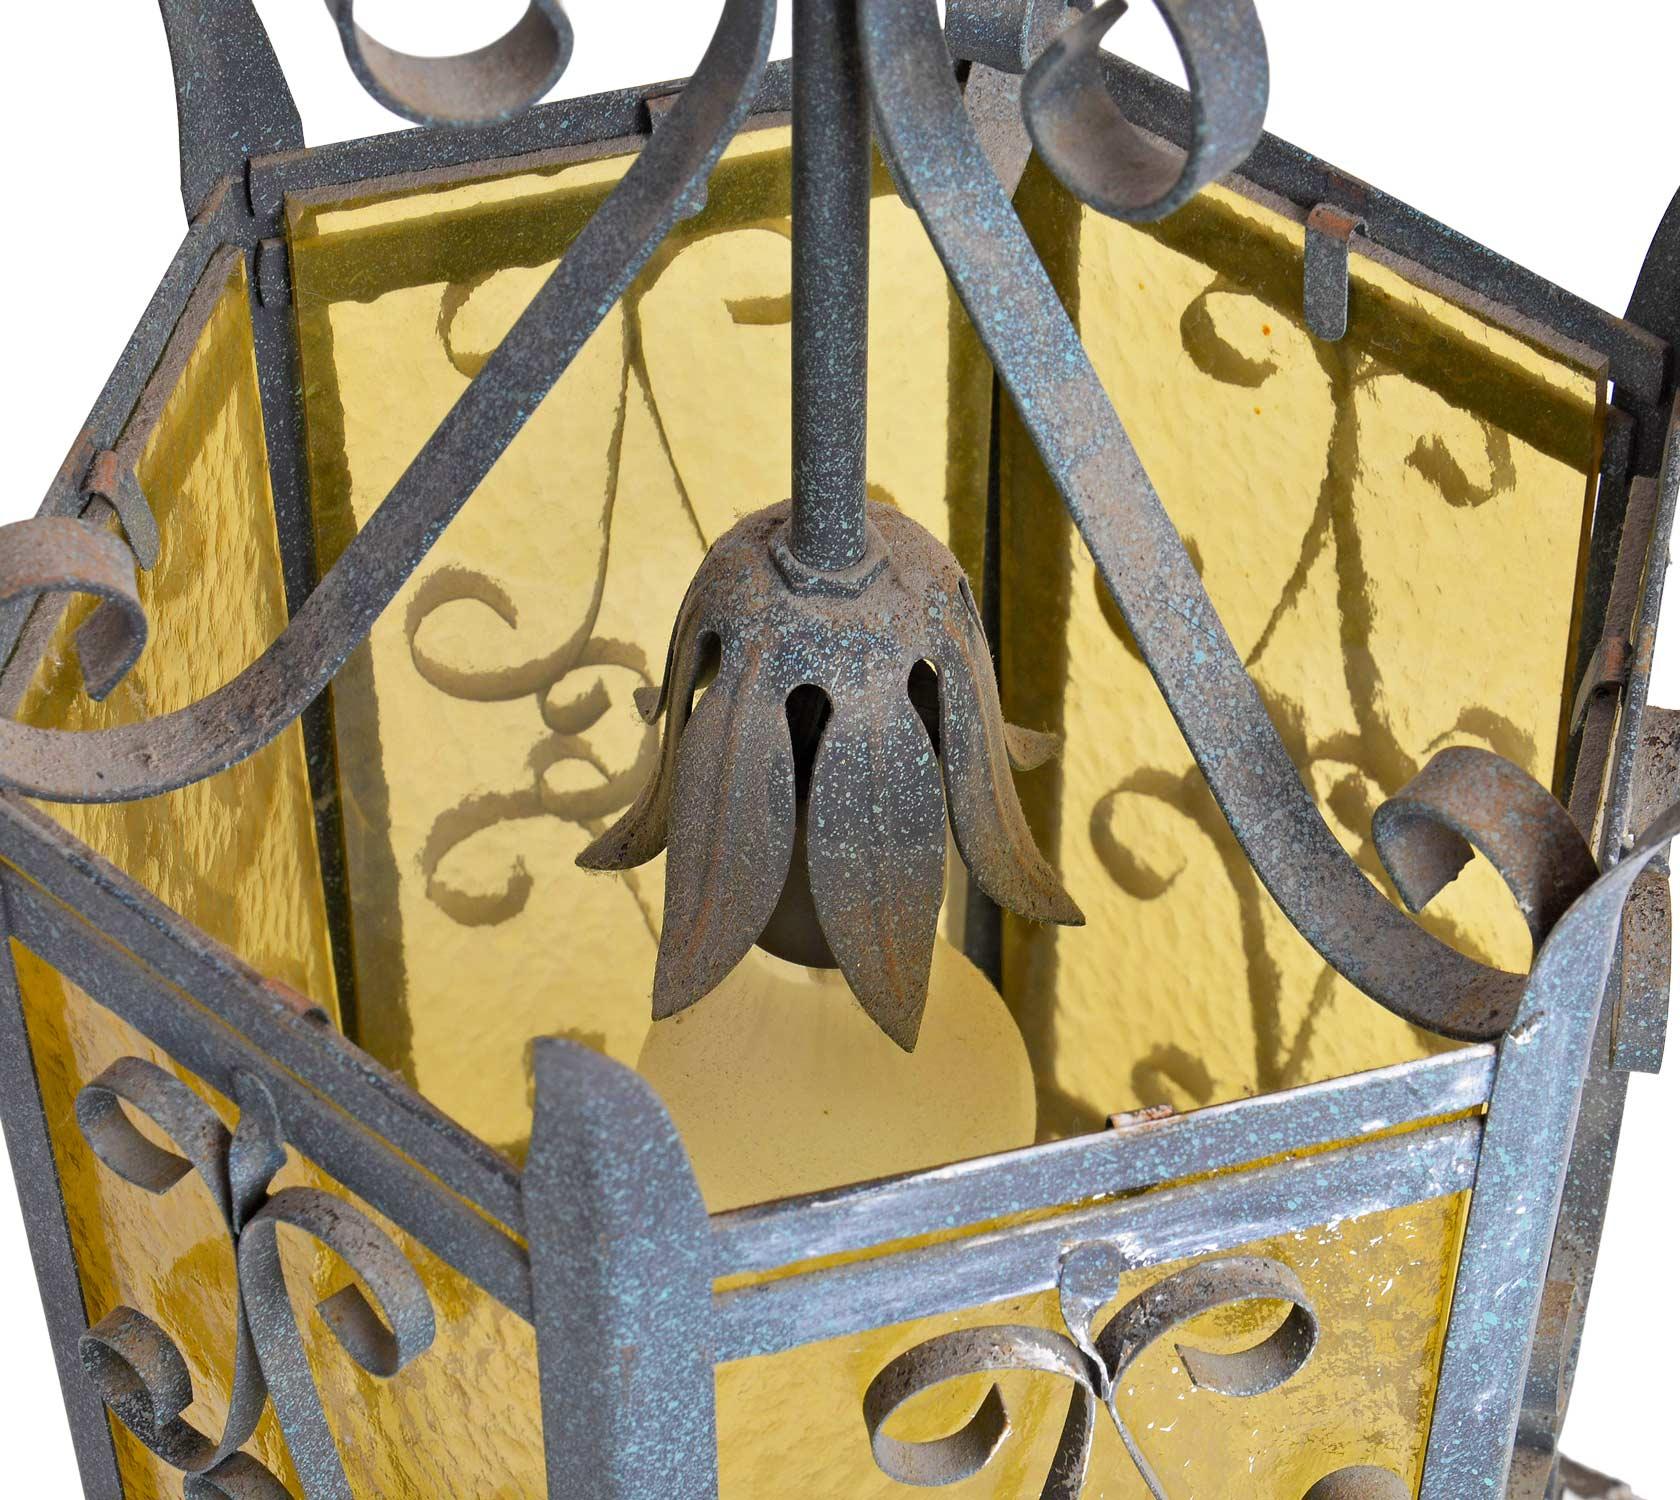 46371-steel-and-amber-glass-pendant-lantern-fitter.jpg